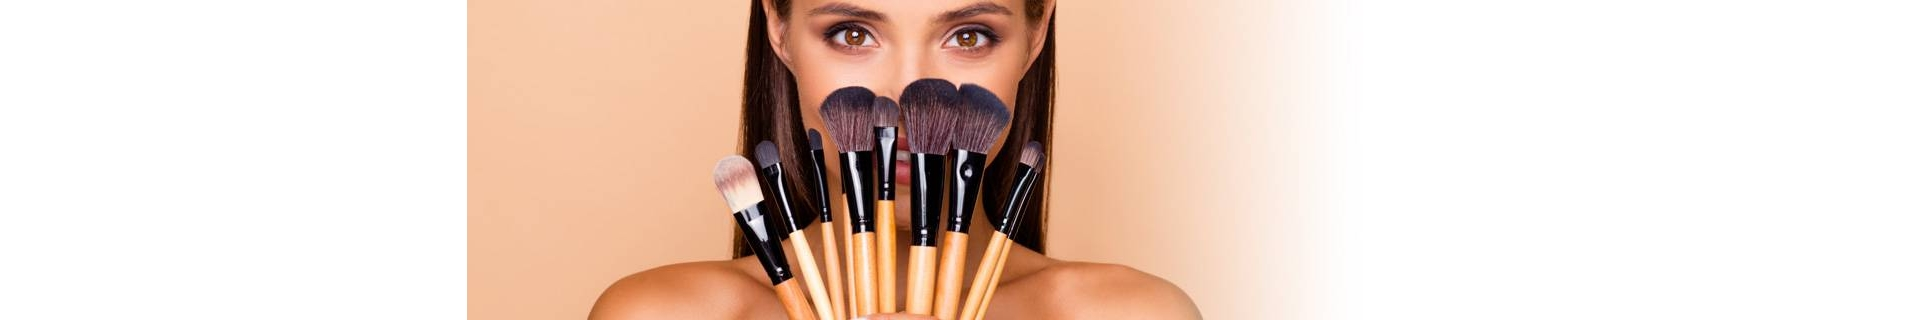 Accessoires de maquillage pas cher | SAGA Cosmetics